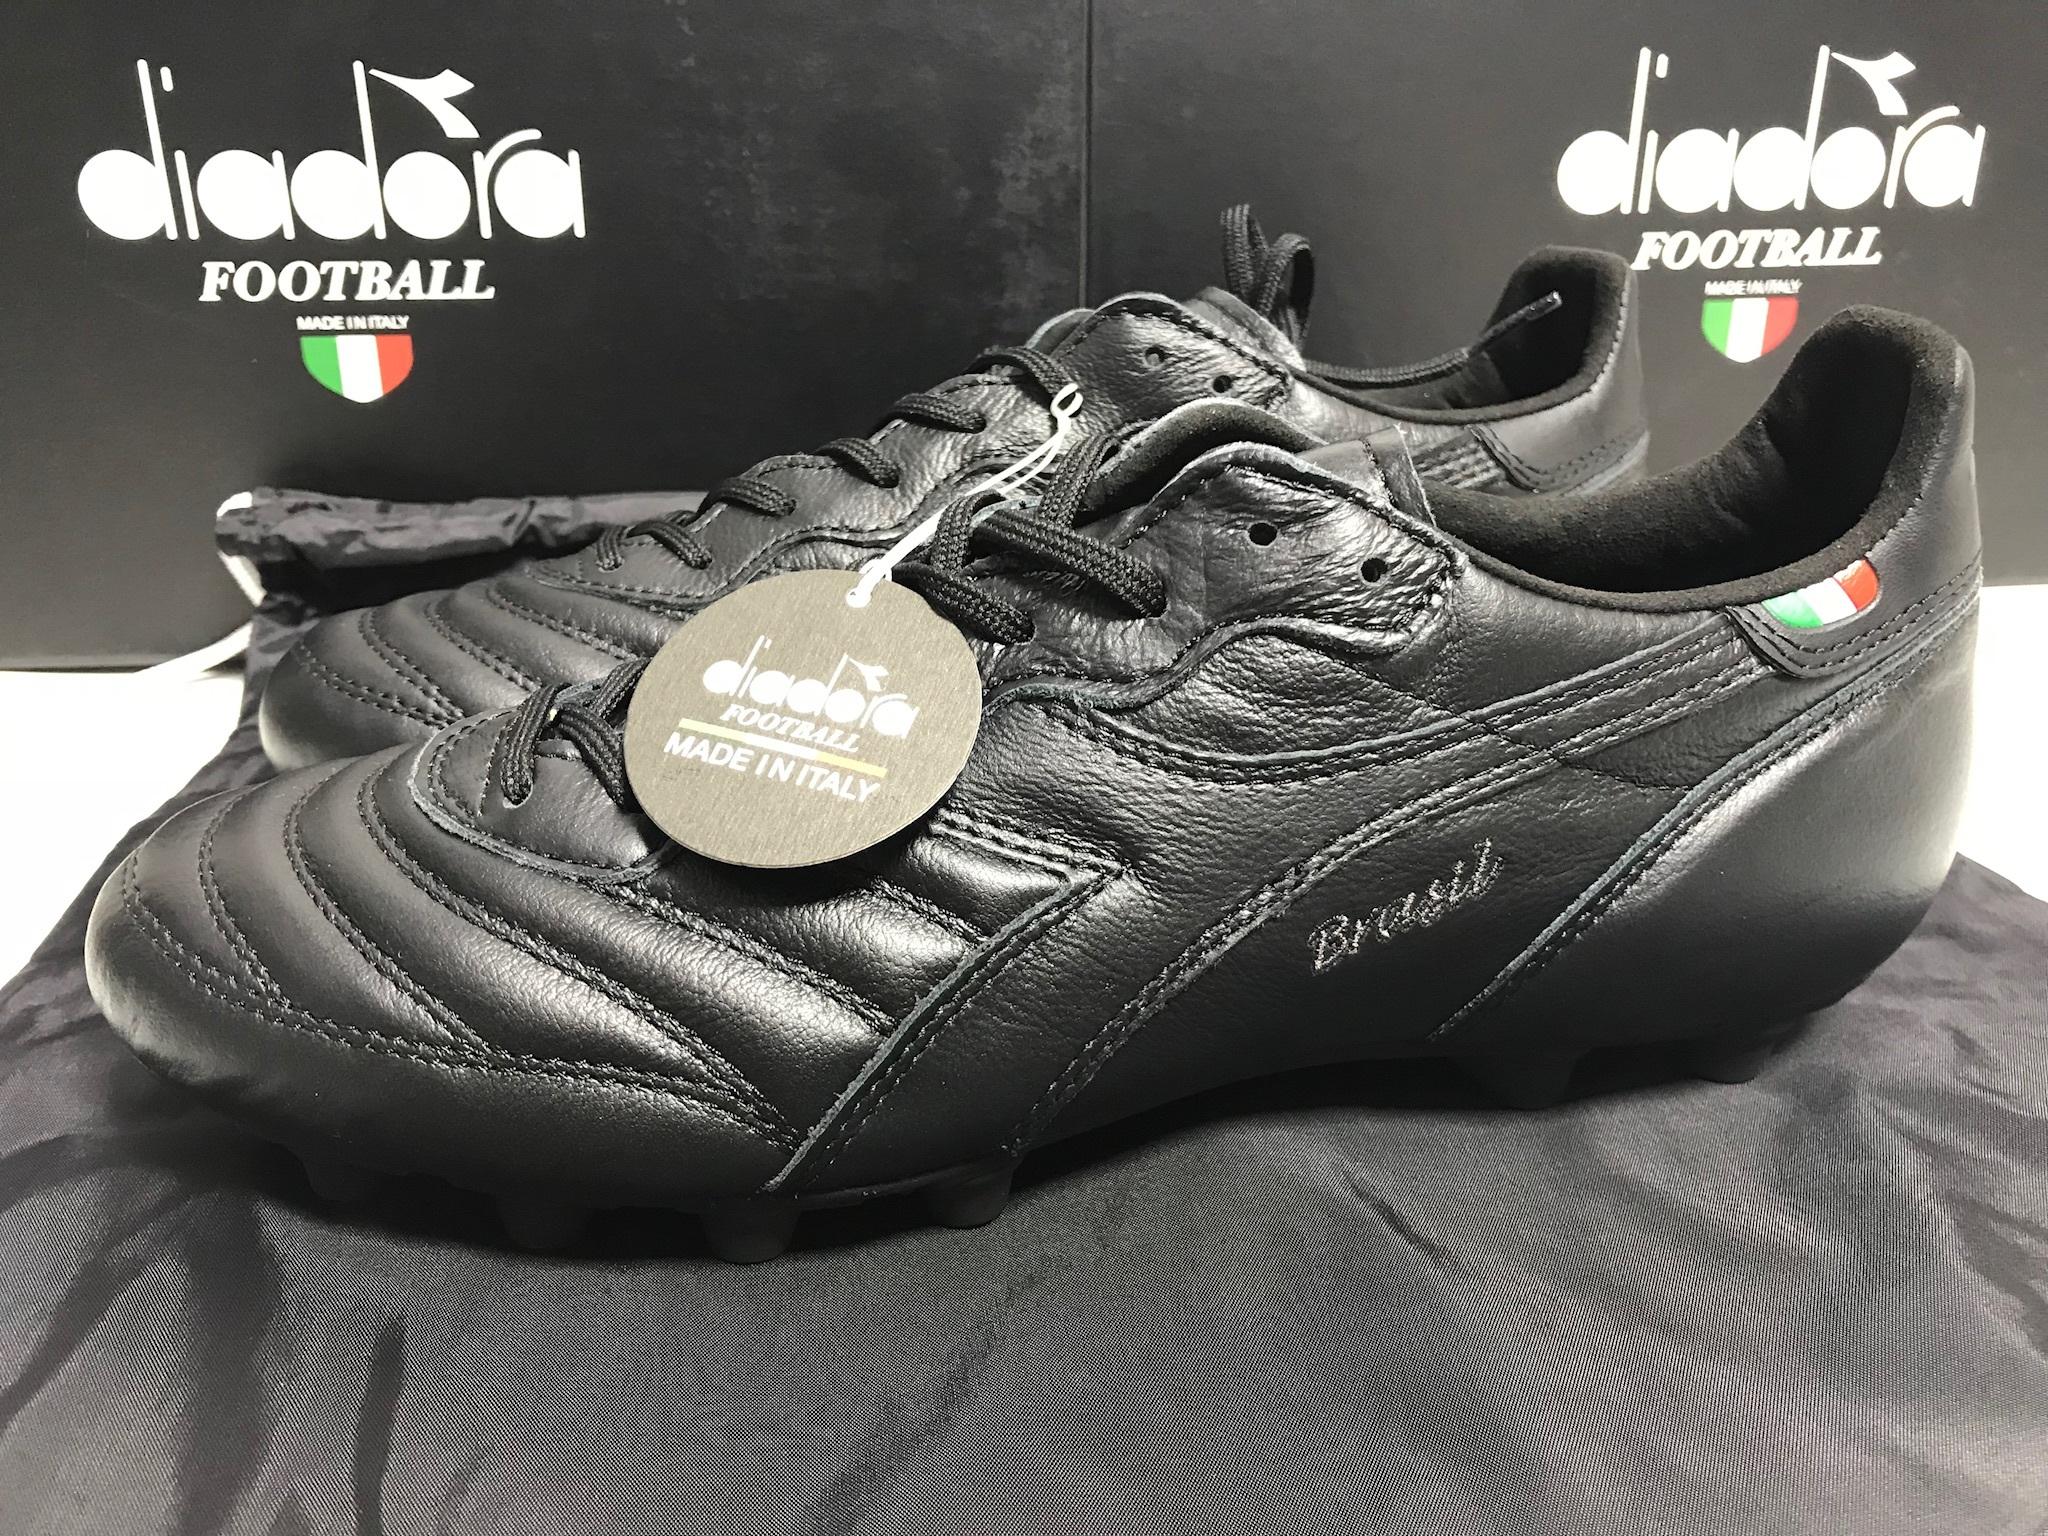 DIADORA-футбольная обувь из Европы.http://lvivopt.com.ua/